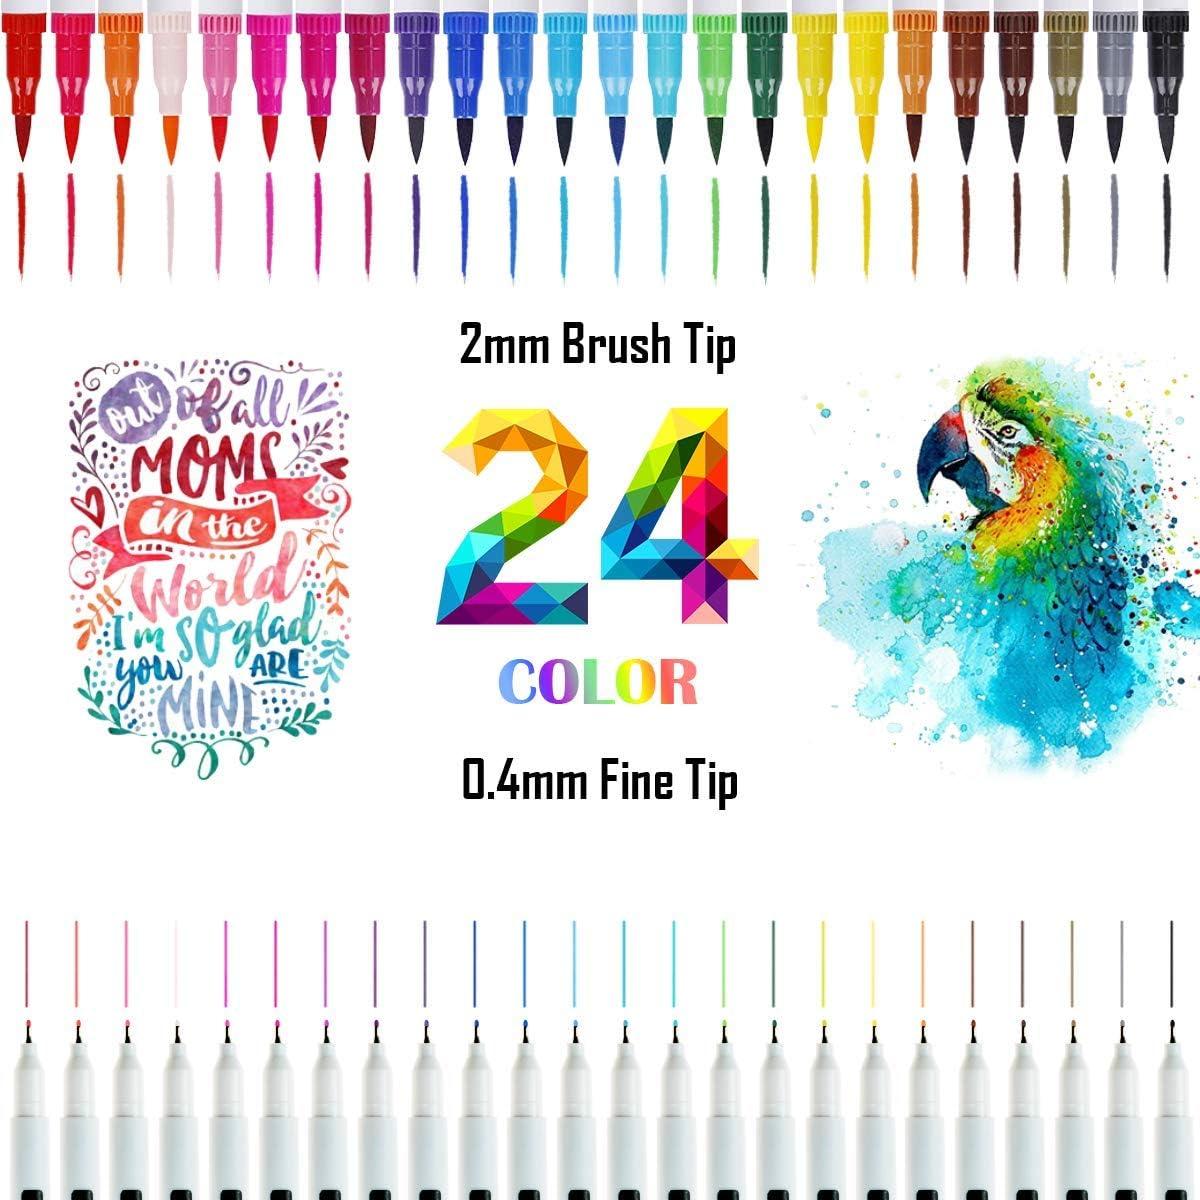 Rotuladores de Punta Doble, 24 Colores Rotuladores Punta Pincel, Pinceles Acuarela para Dibujo, Boceto, Diseño, Firma, Cómic (Blanco)